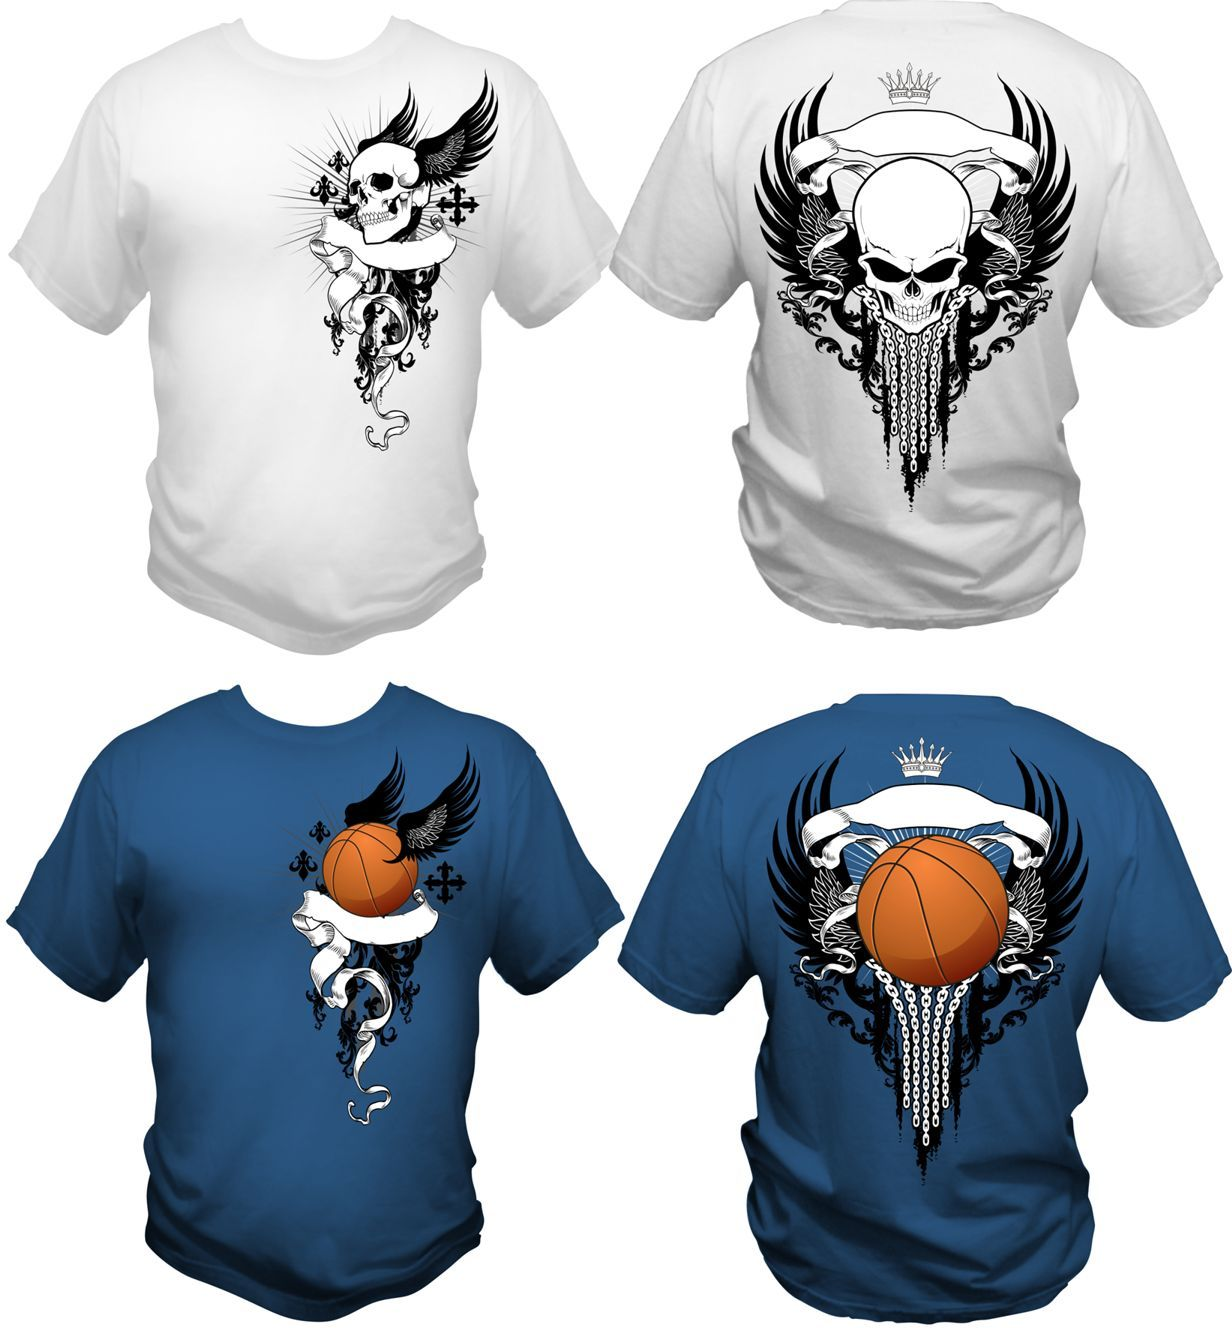 Free TShirt Design by on